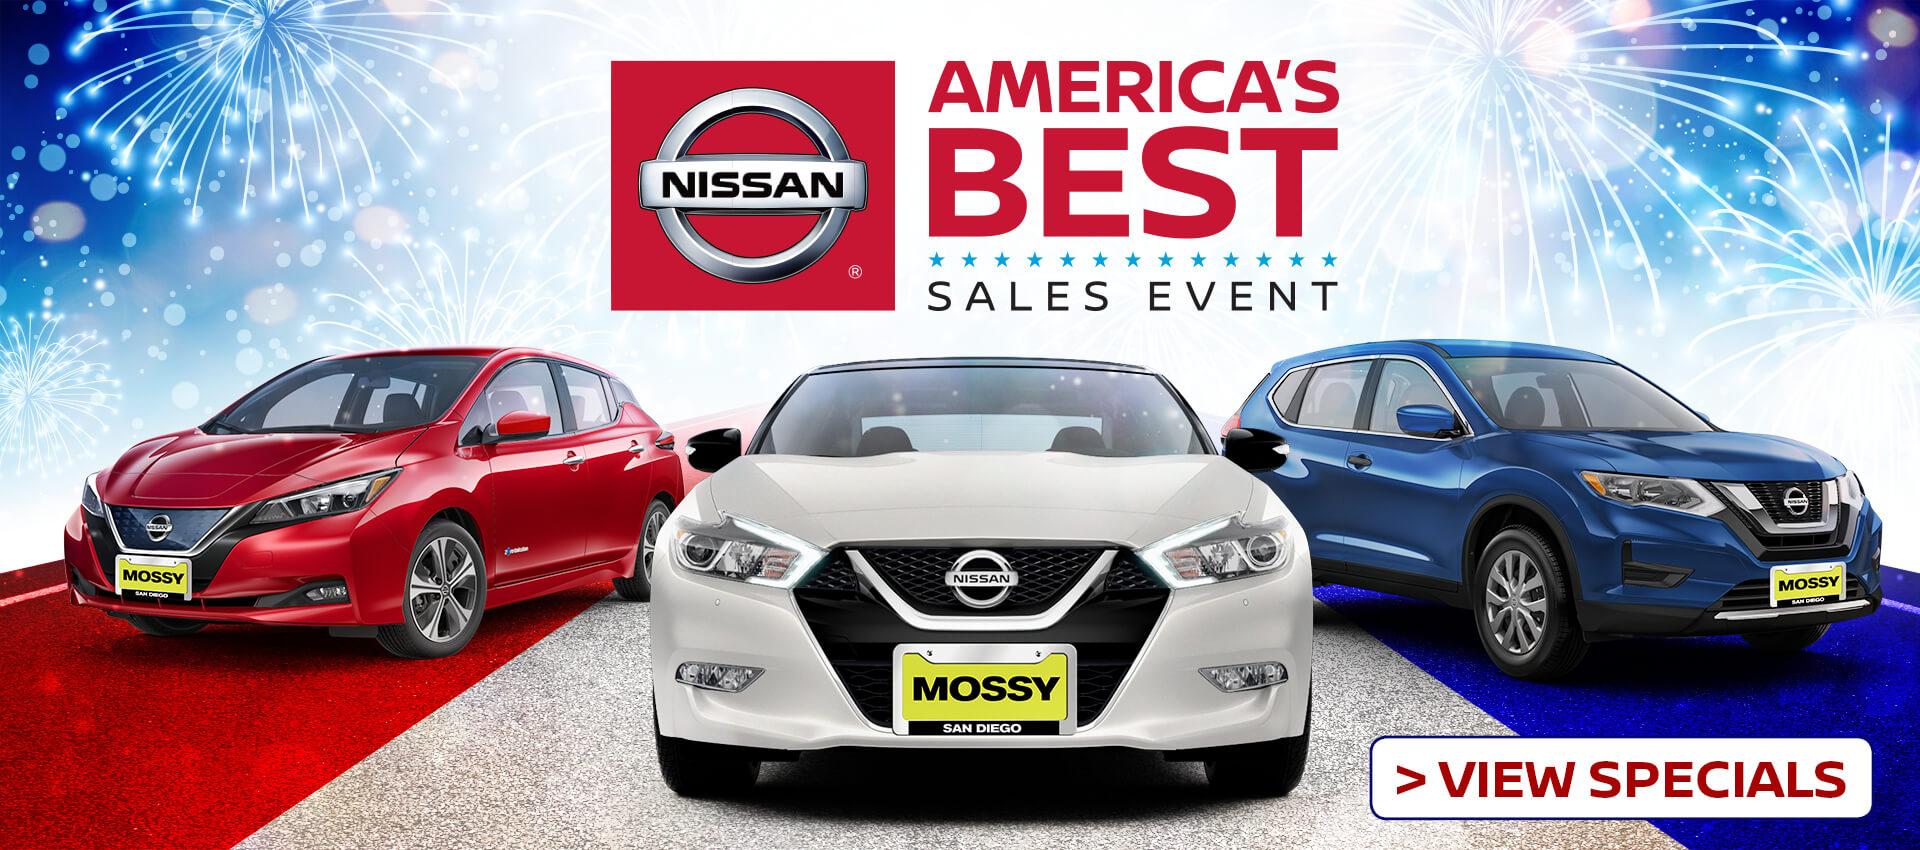 Mossy Nissan El Cajon >> New 2017-2018 Nissan & Used Car Dealer in San Diego, CA | Mossy Nissan 7 Locations